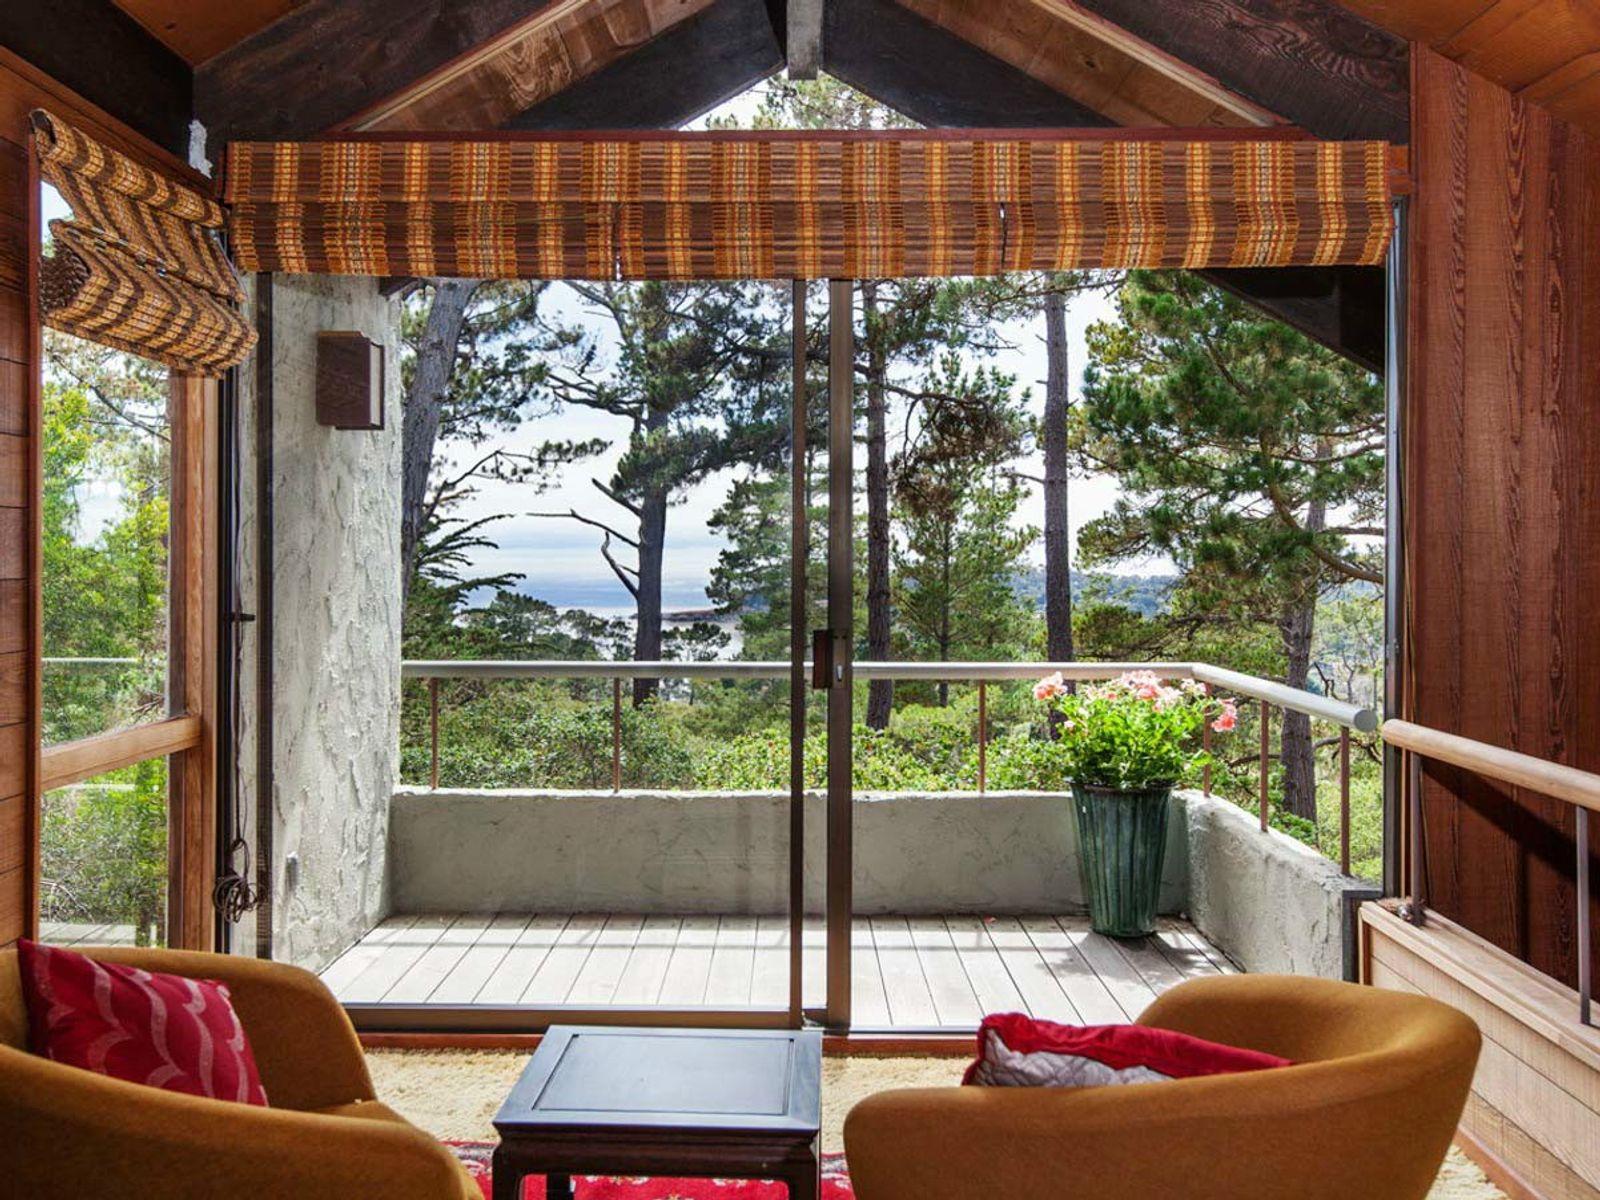 Fabulous Estate Property in Pebble Beach